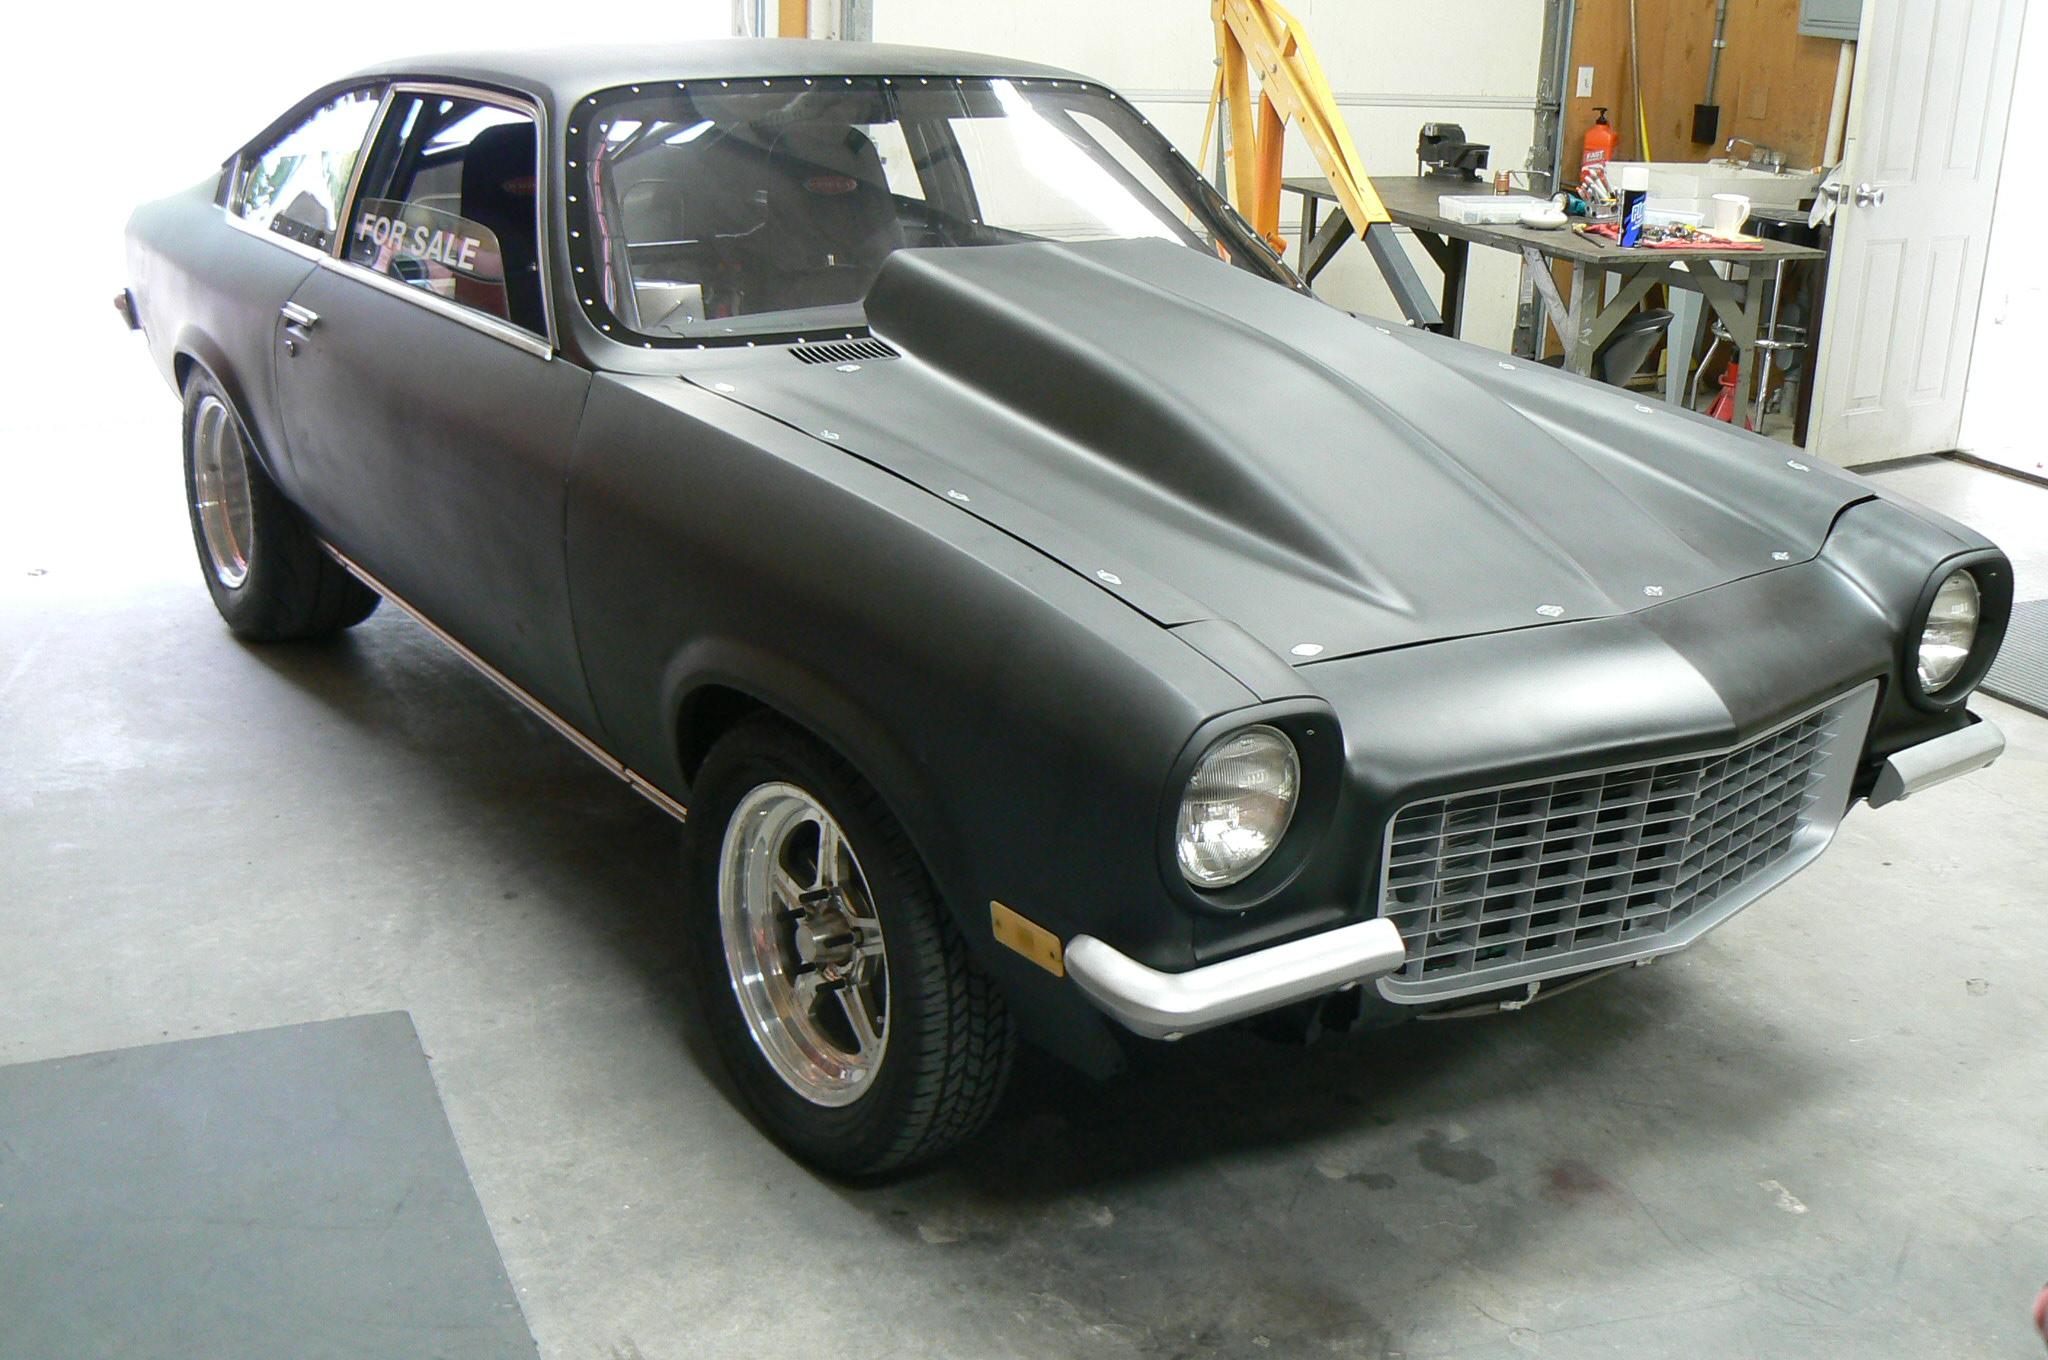 1972 chevy vega street car for sale for Motor cars for sale